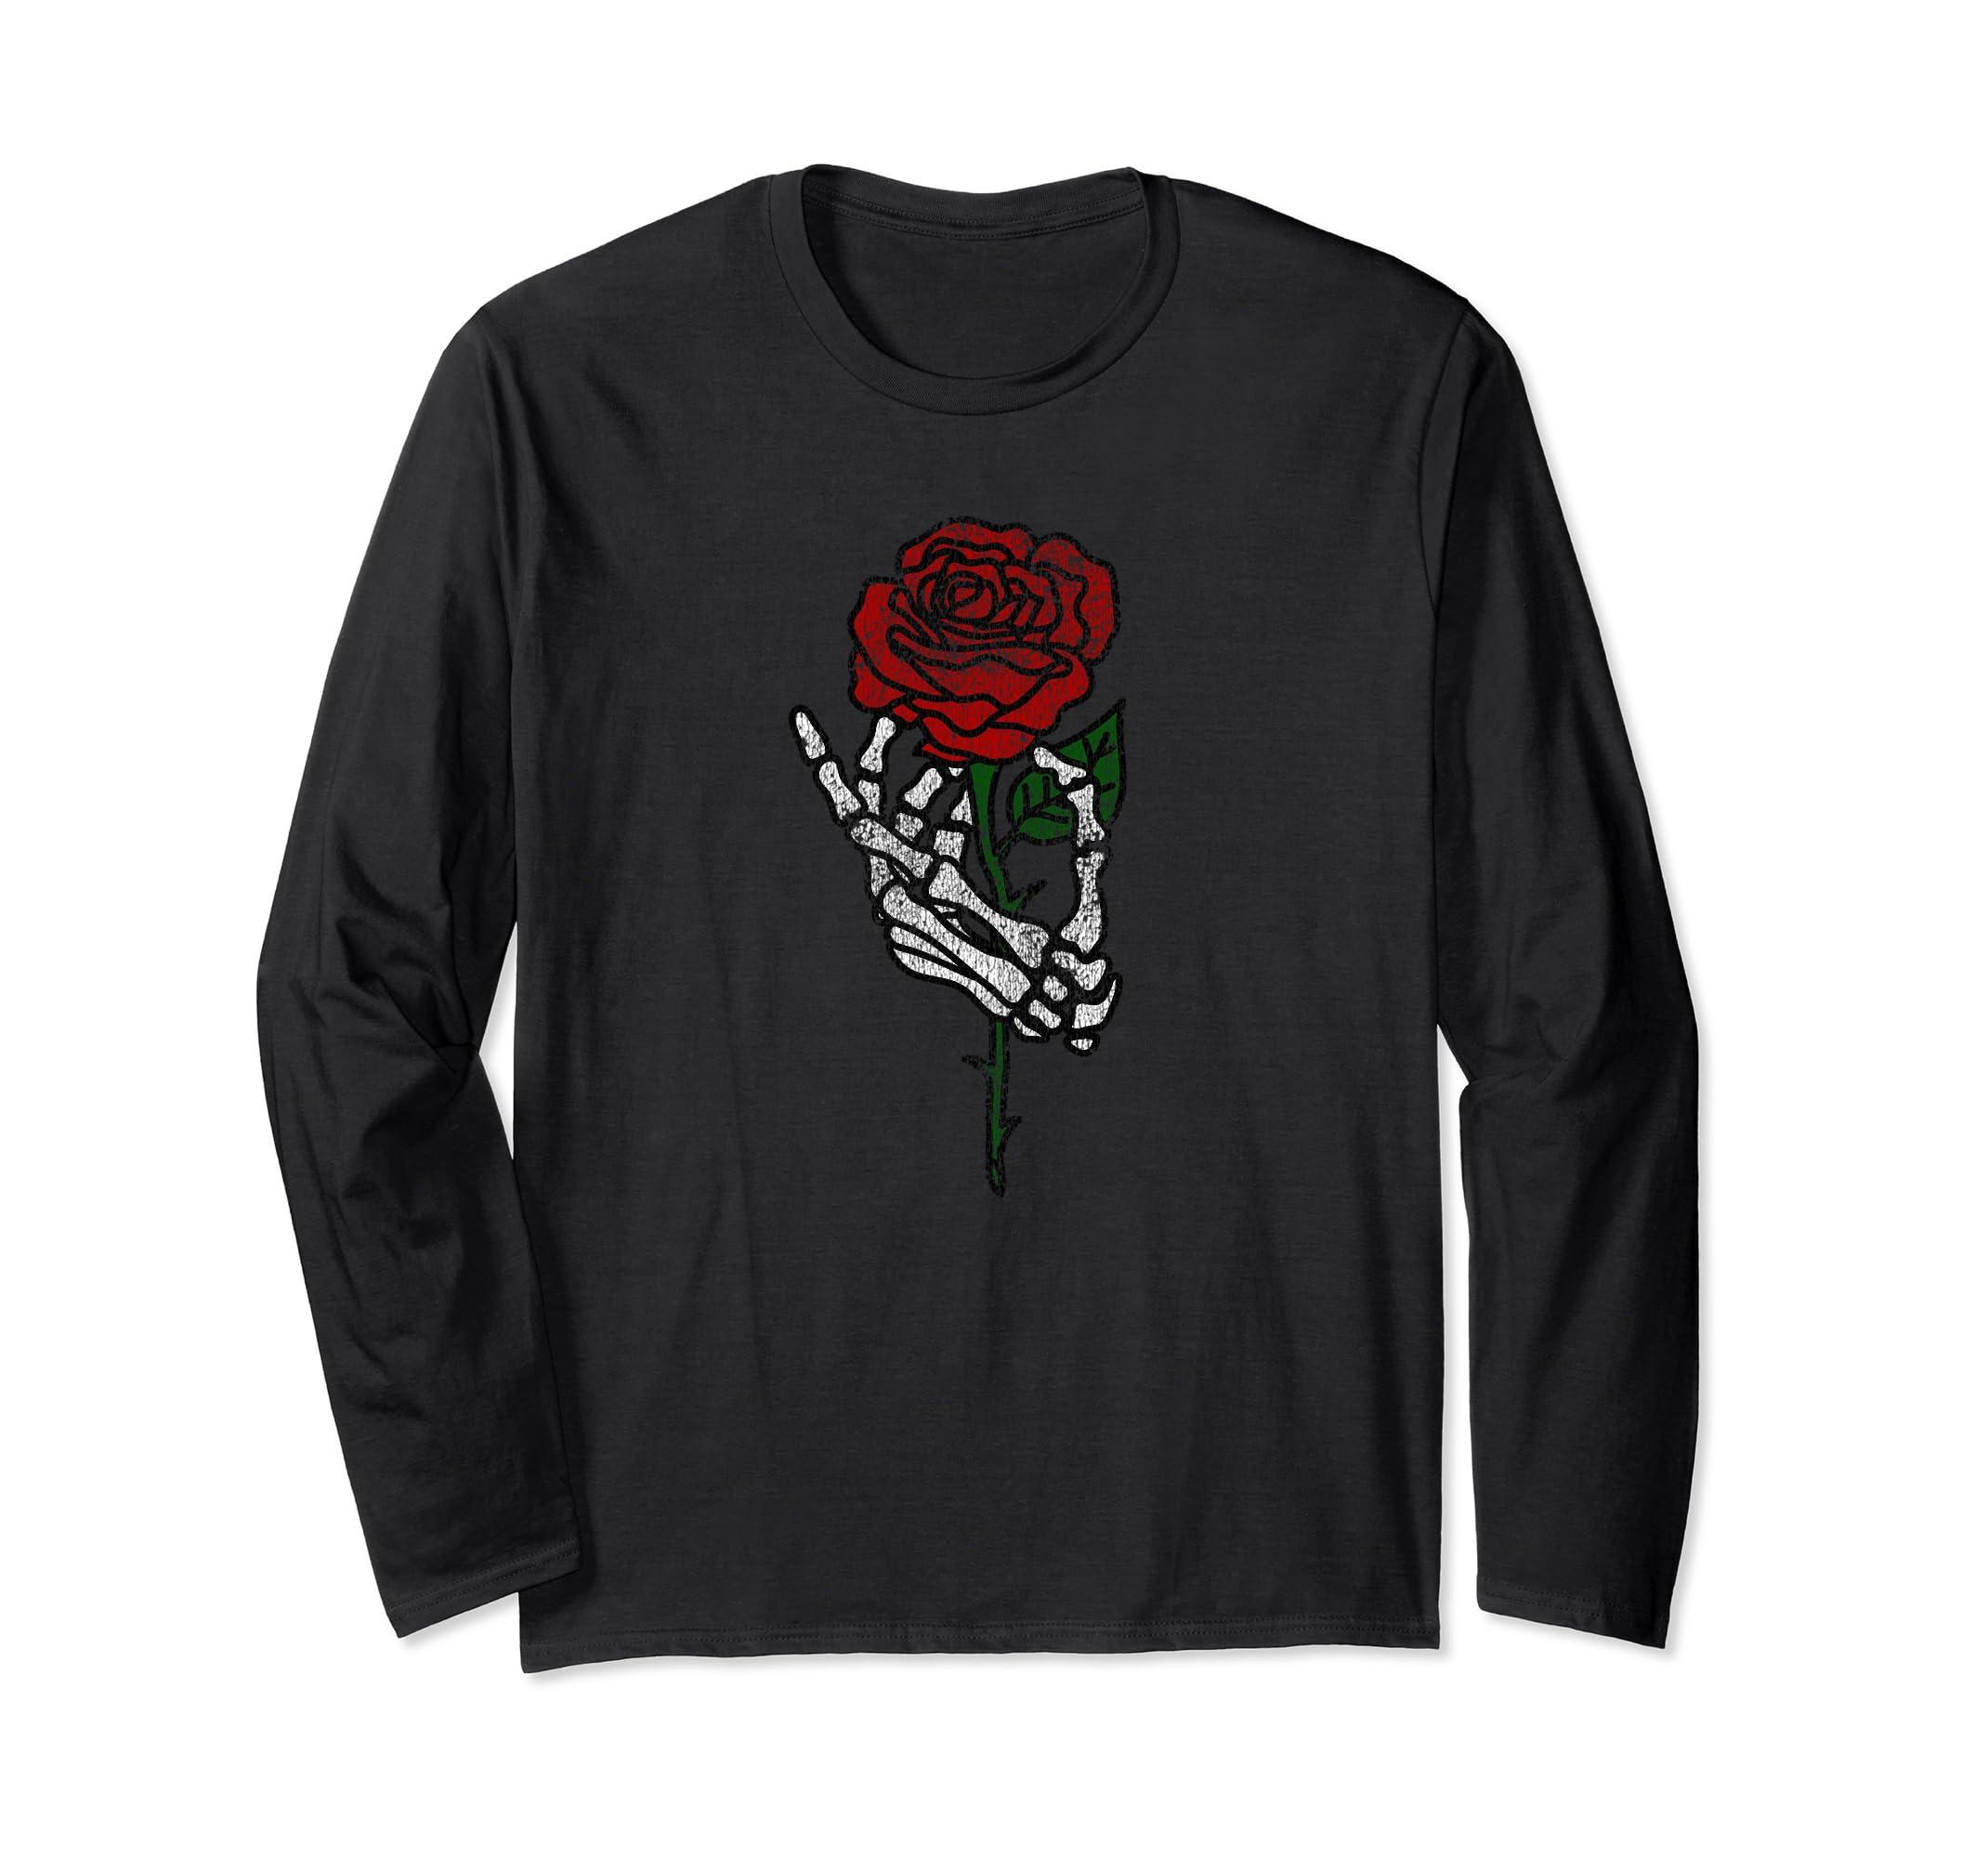 Skeleton Hand Holding Rose Long Sleeve Shirt, Vintage